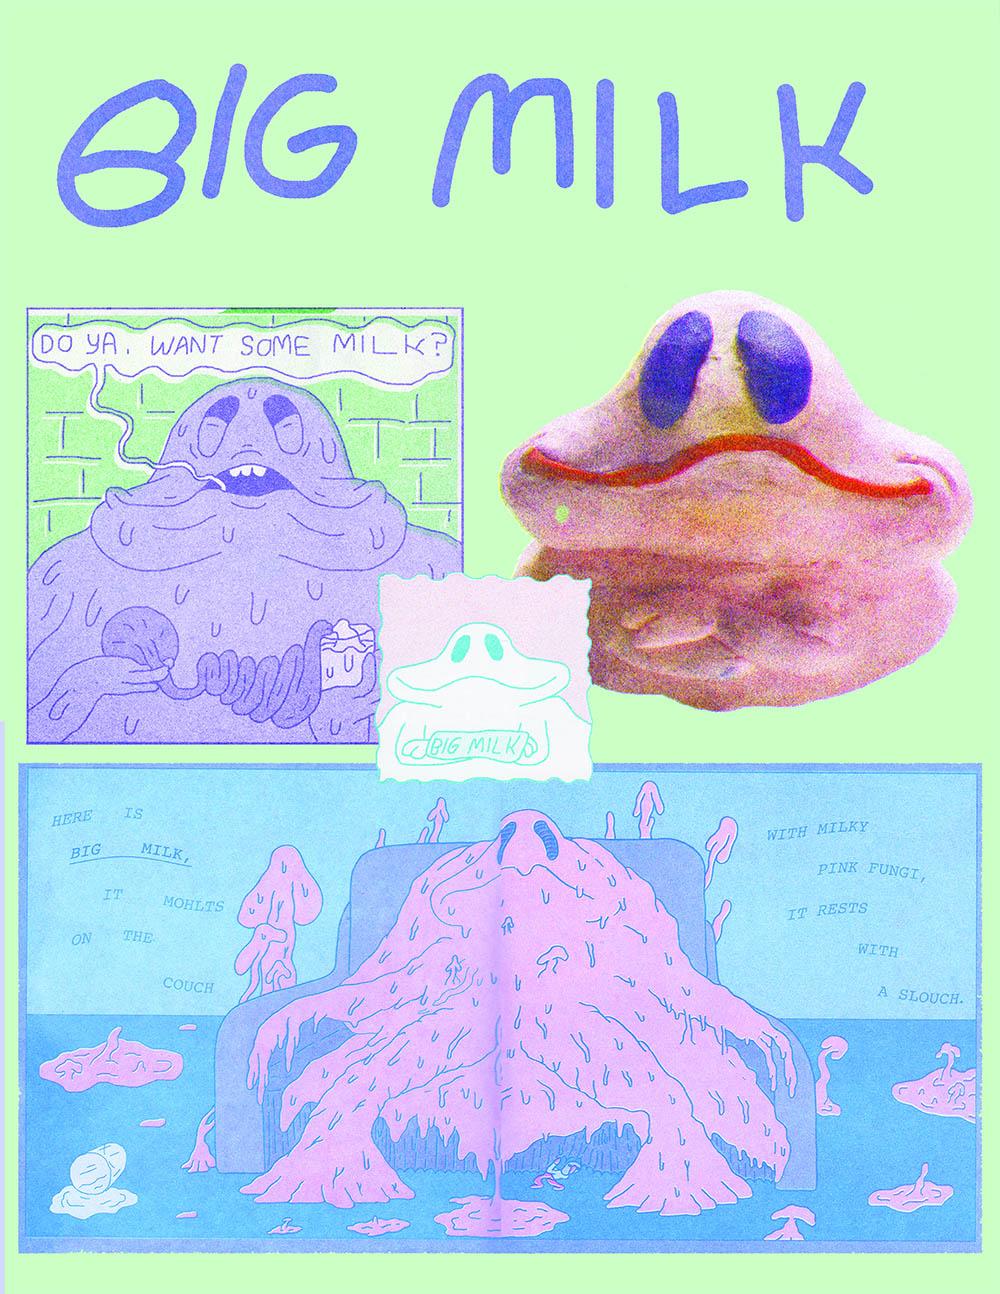 CC CH pdf_0003s_0002_big milk.jpg